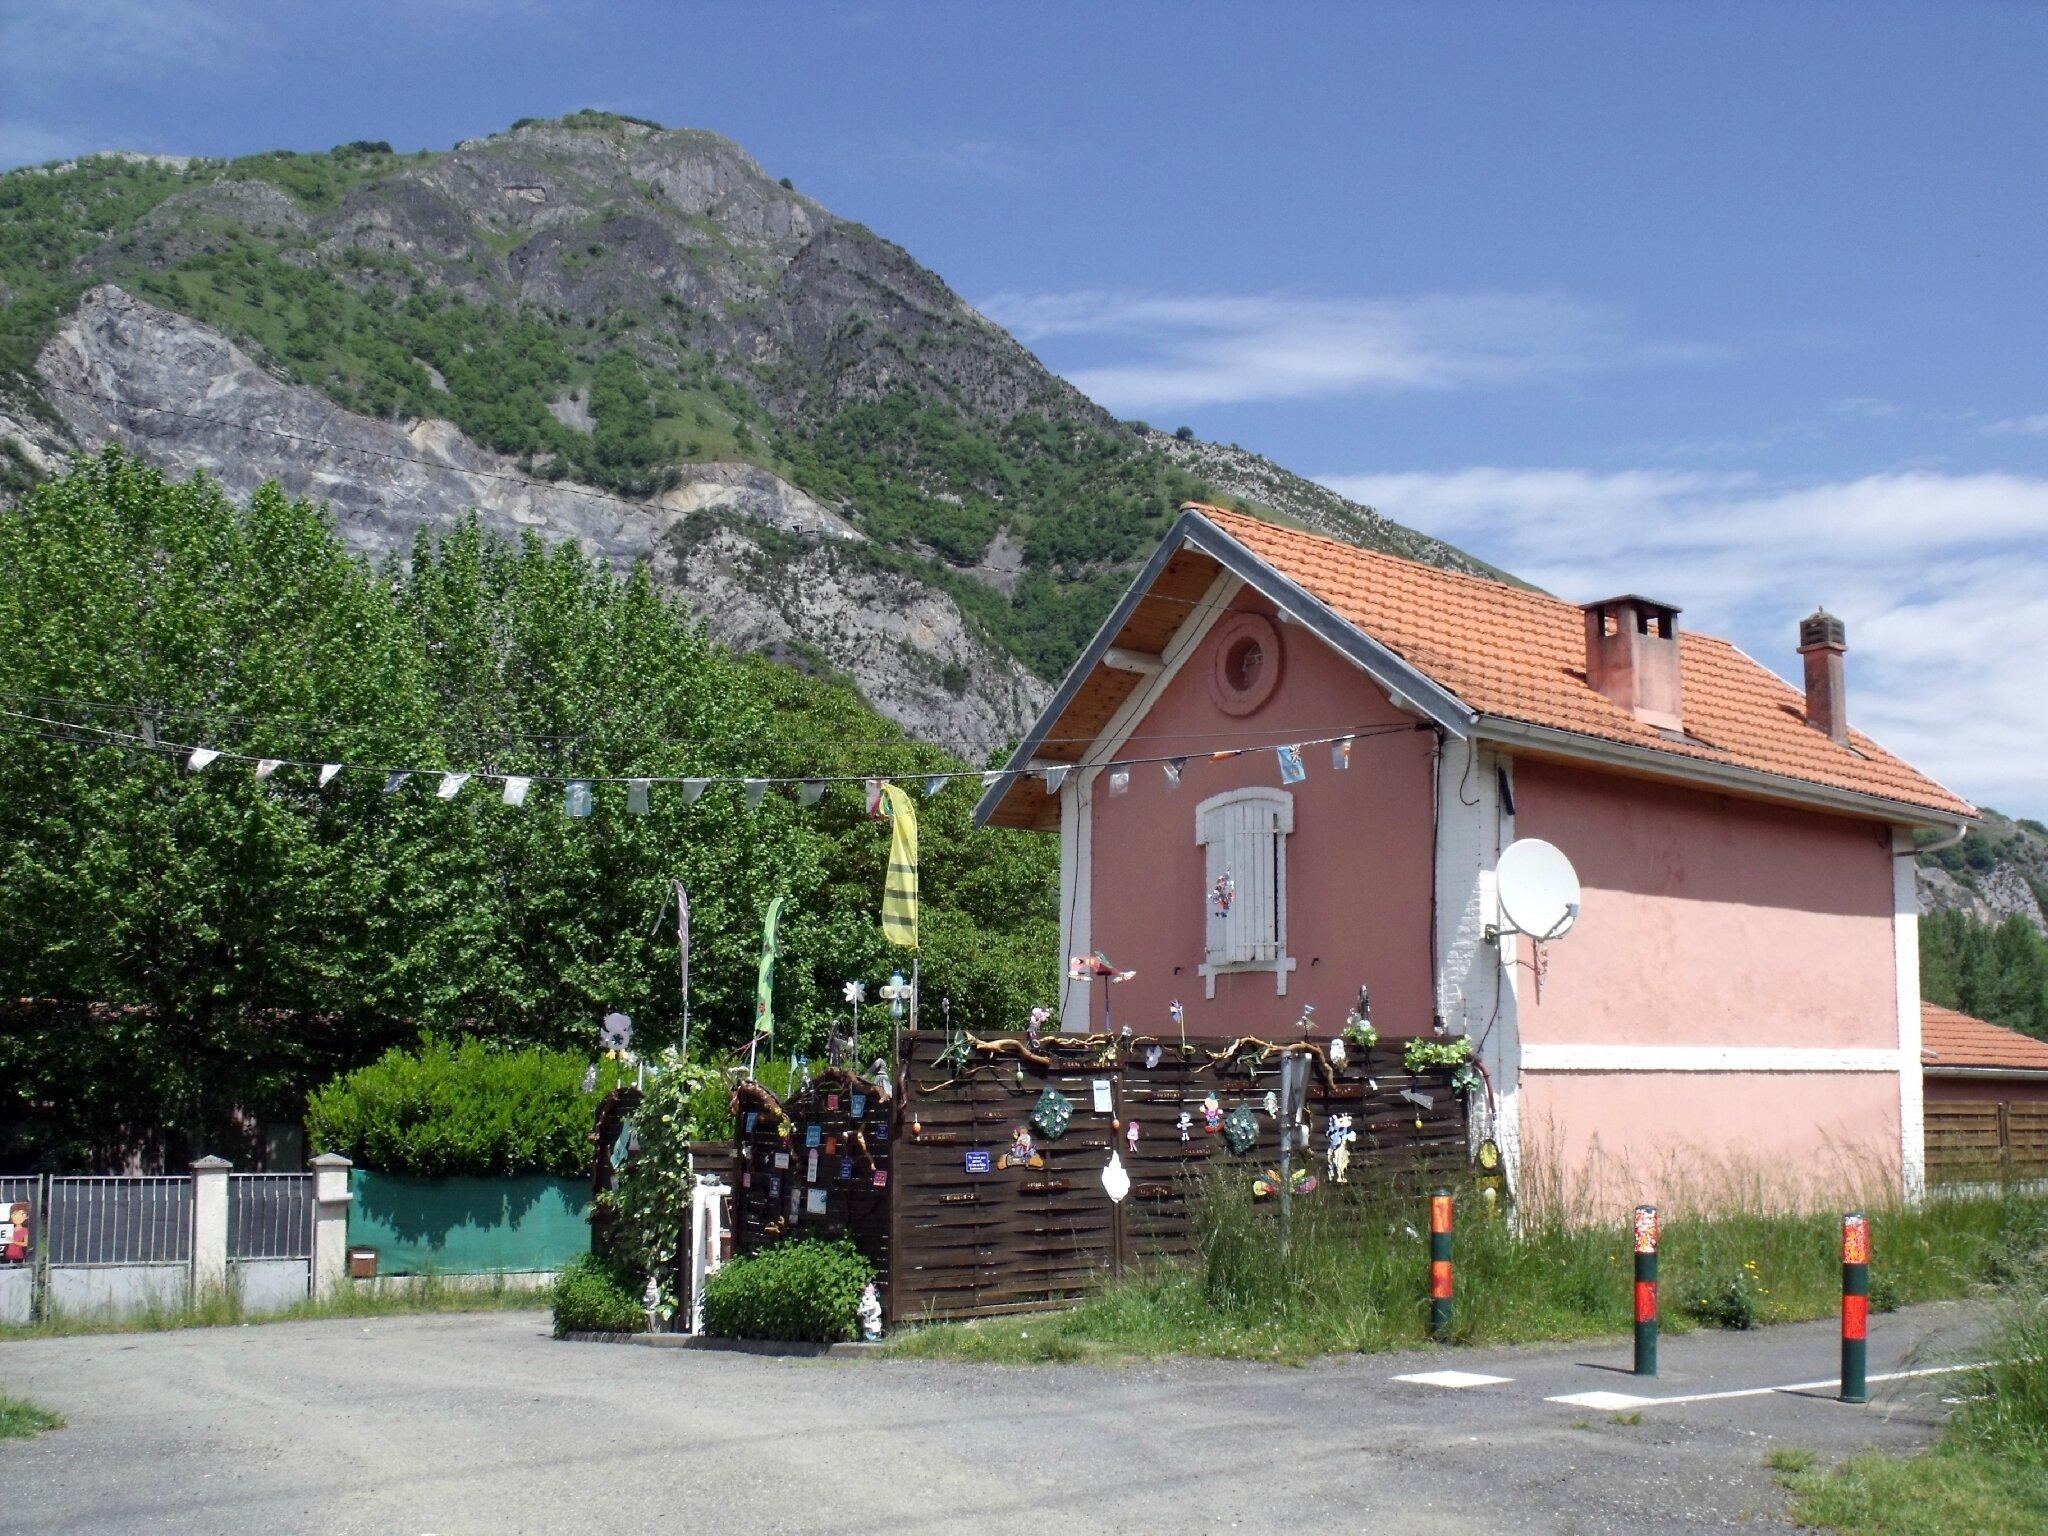 Geu-Pibeste (Hautes-Pyrénées - 65)